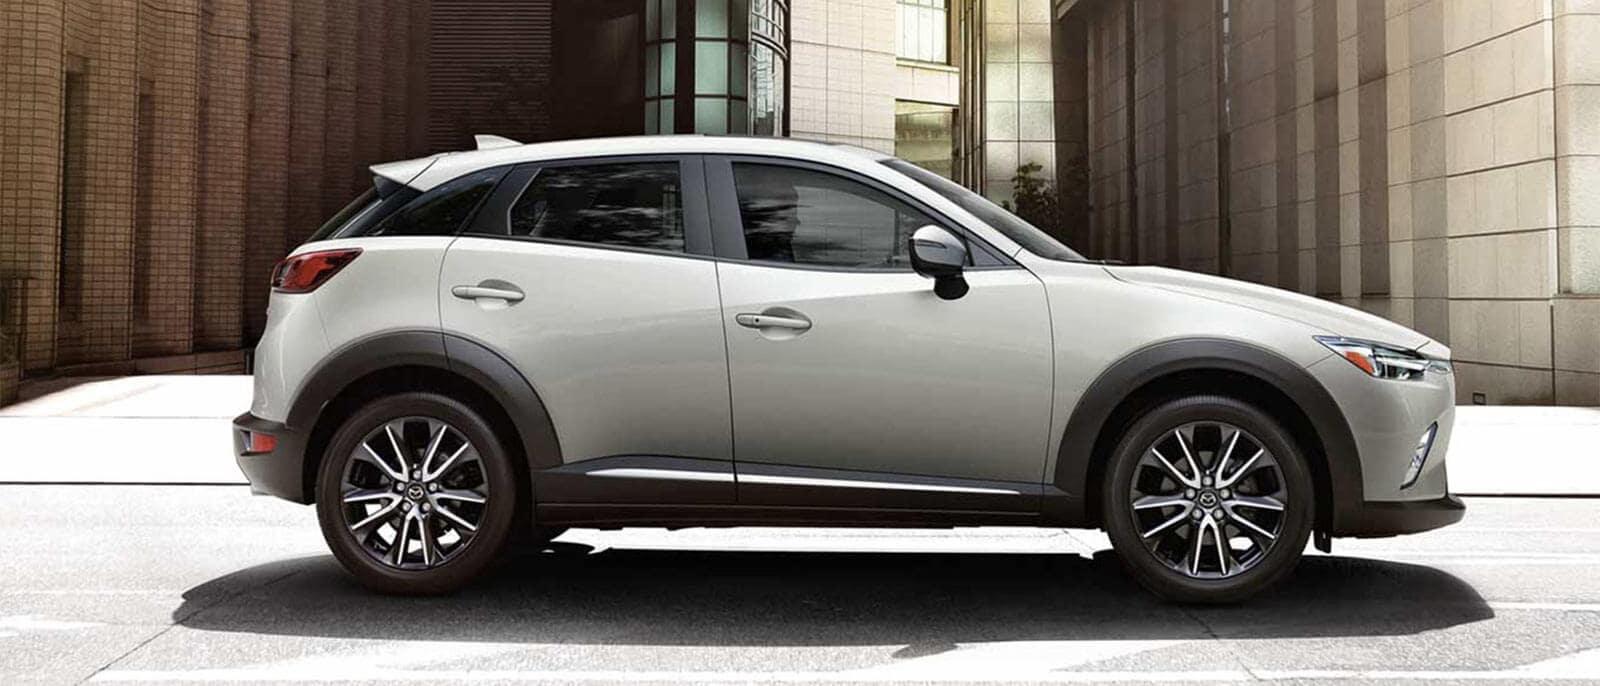 2018 Mazda CX-3 Parked